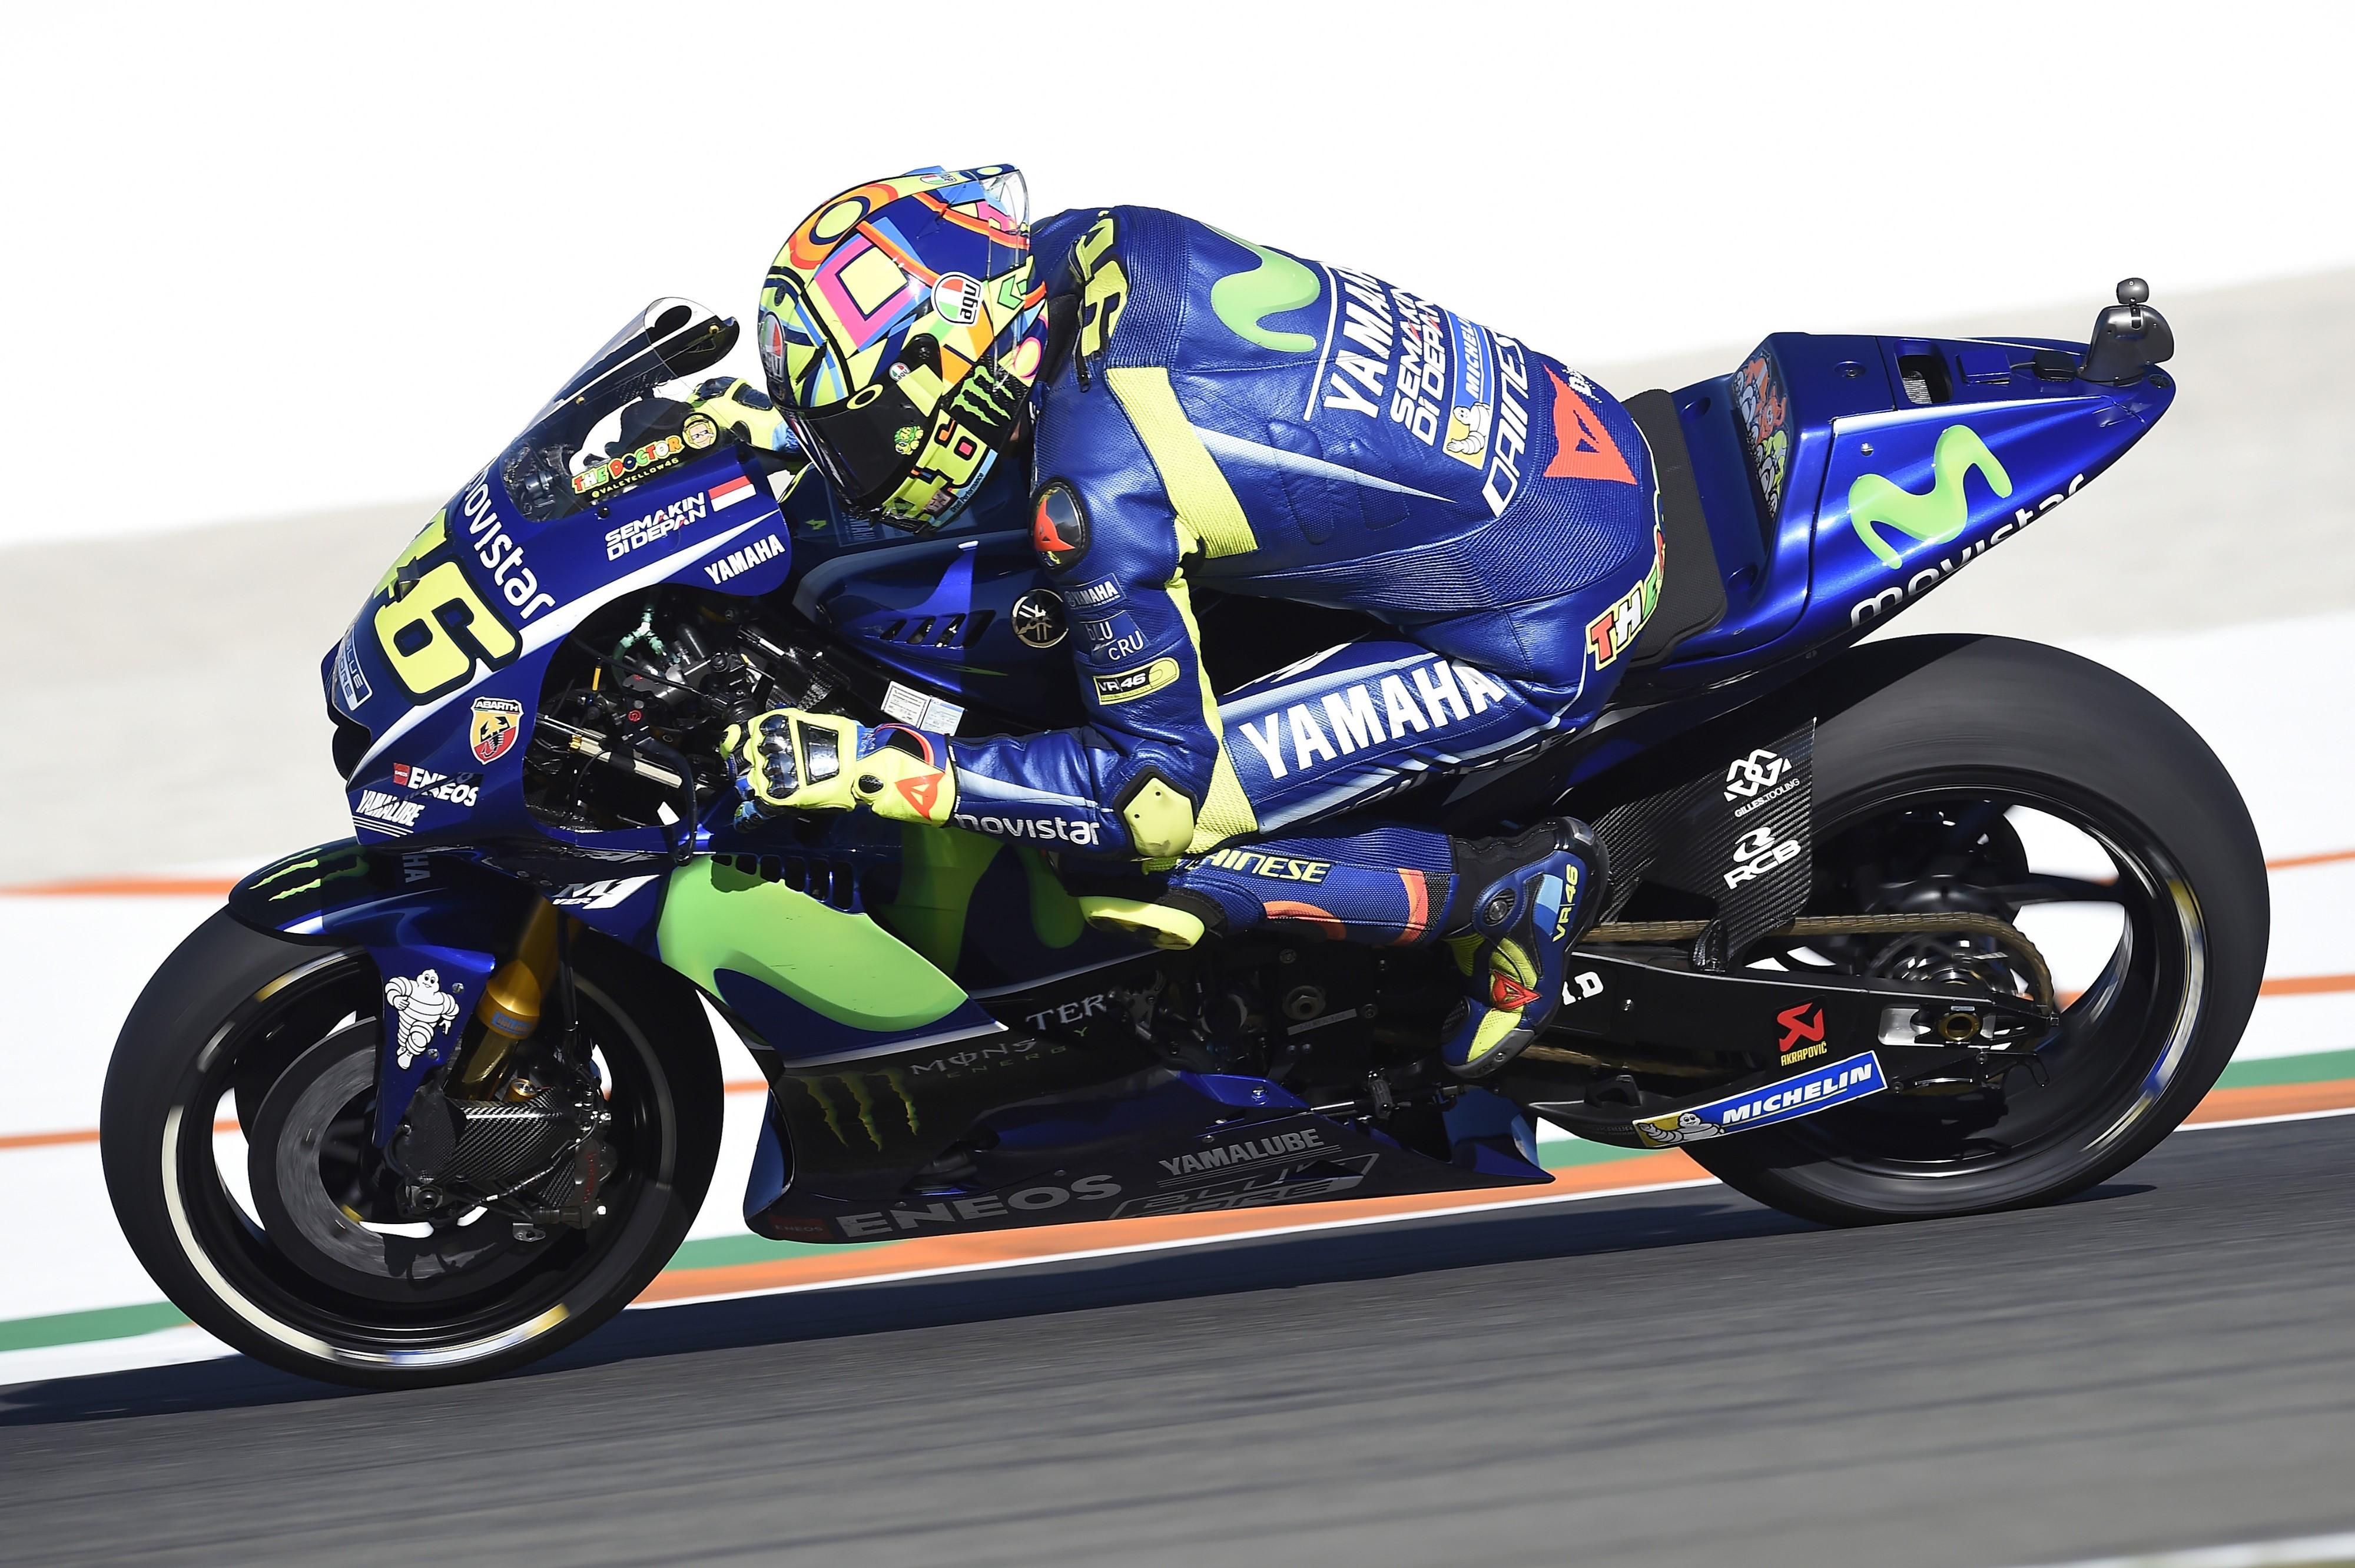 Valentino Rossi (Yamaha Factory) au Grand Prix de Valence 2017